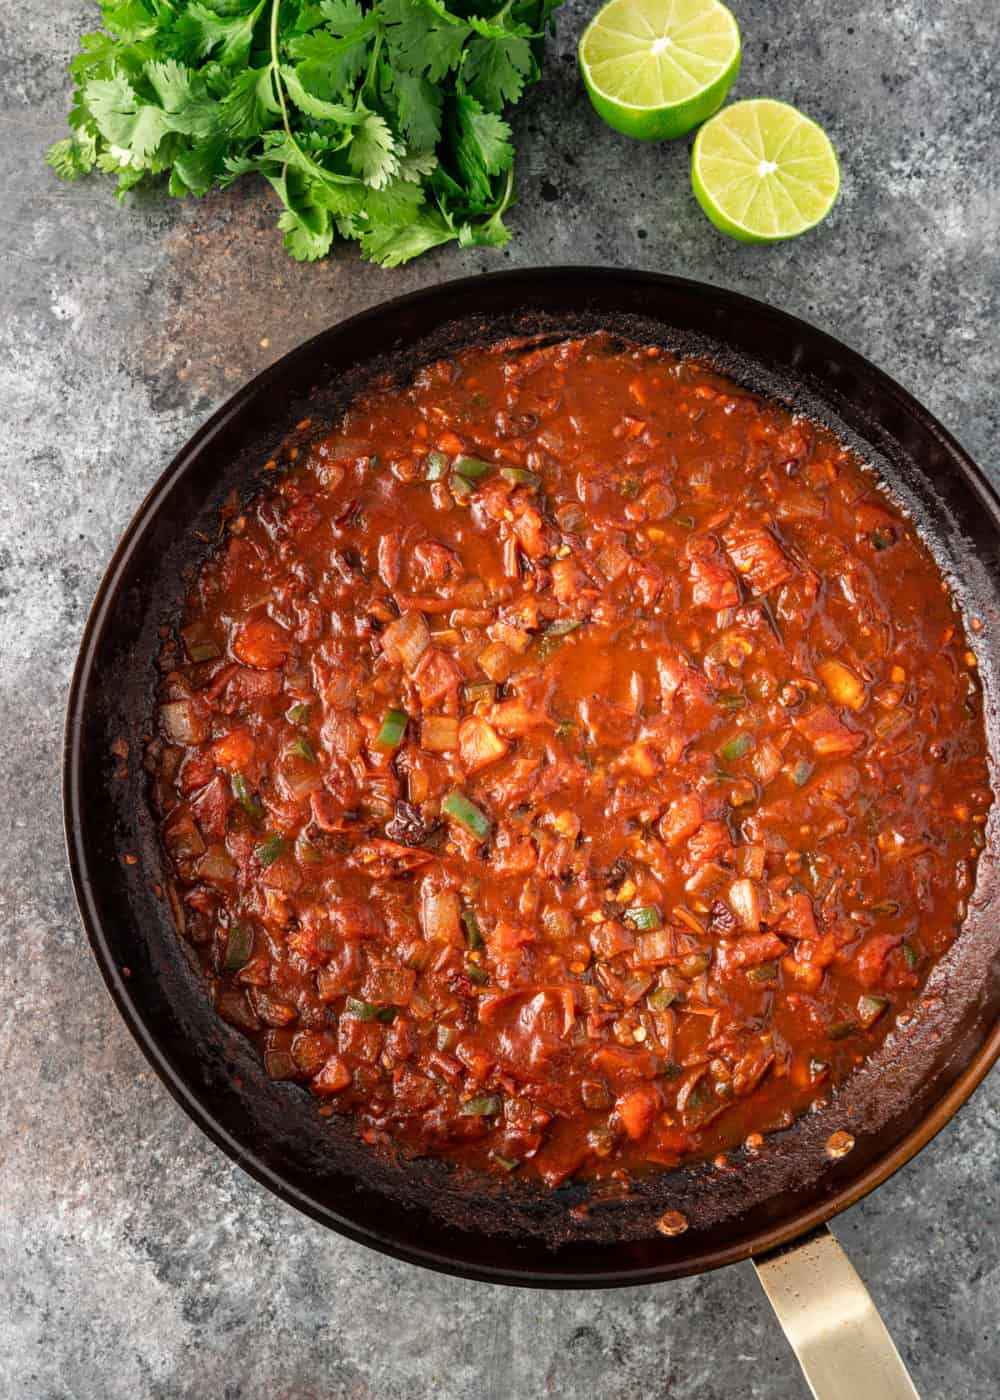 ranchero sauce in saucepan, before pureeing